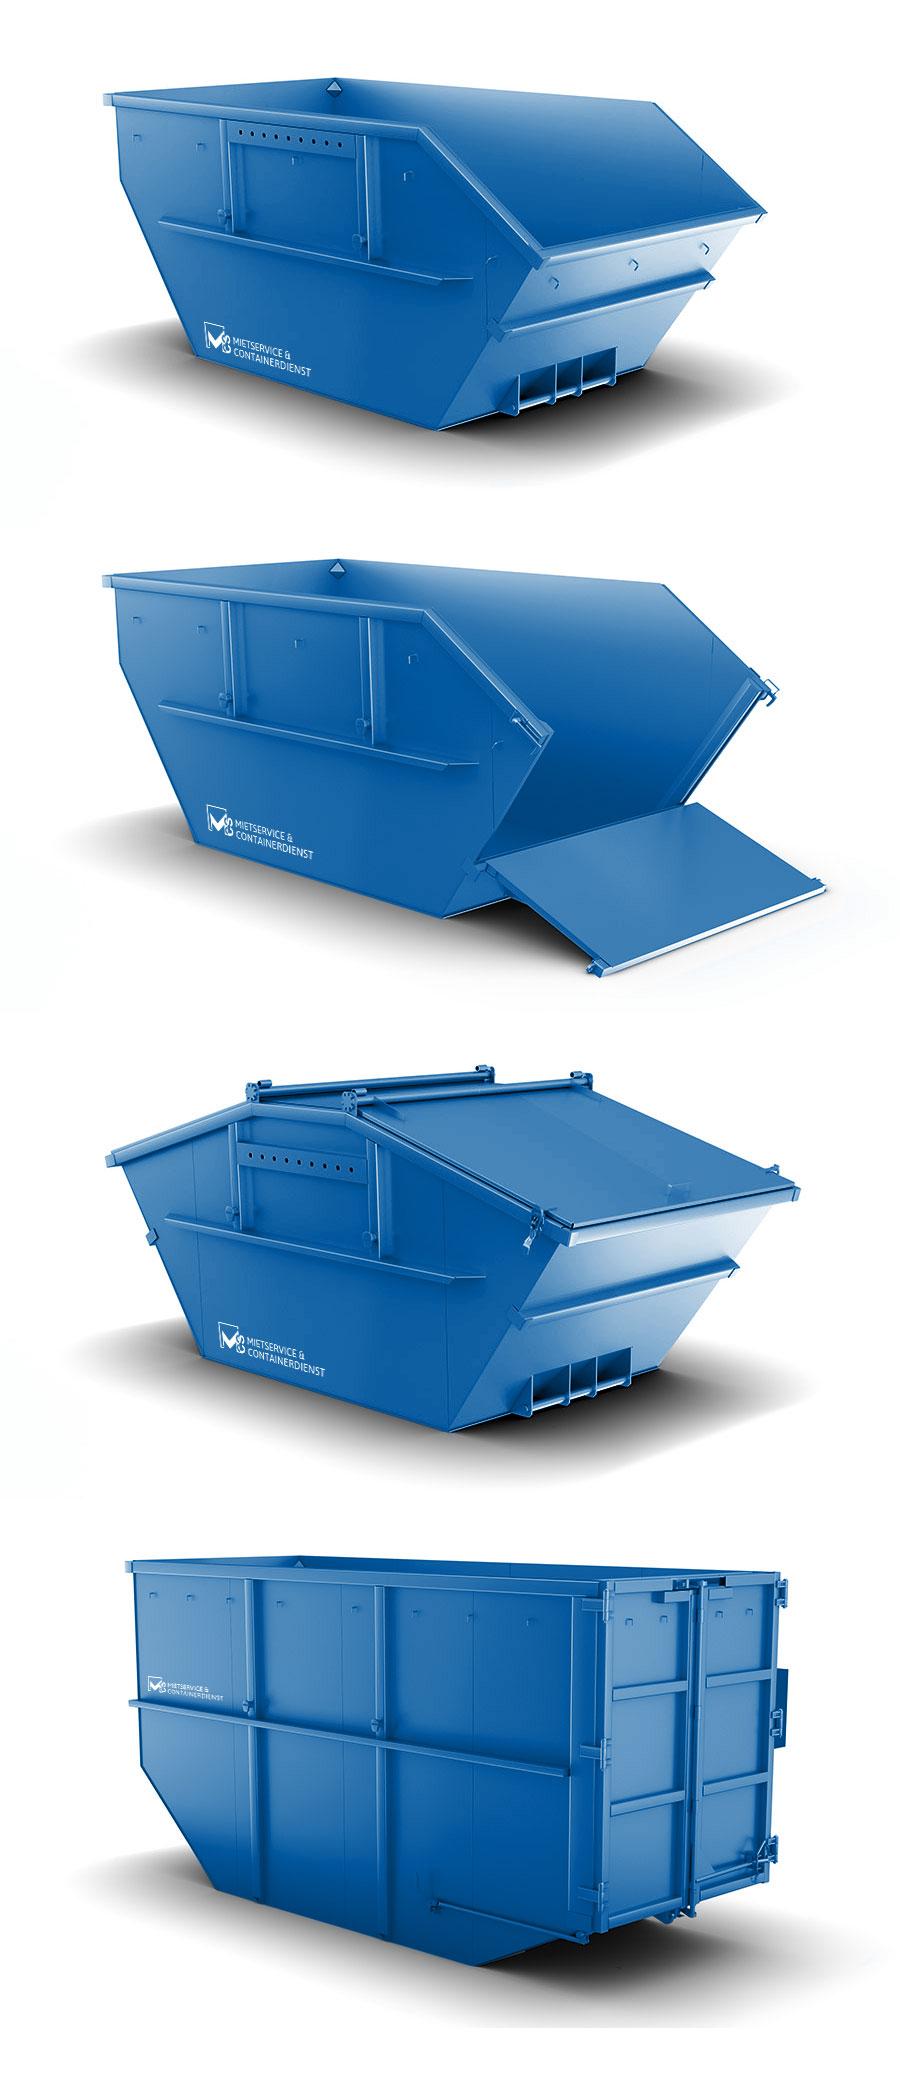 Containervarianten